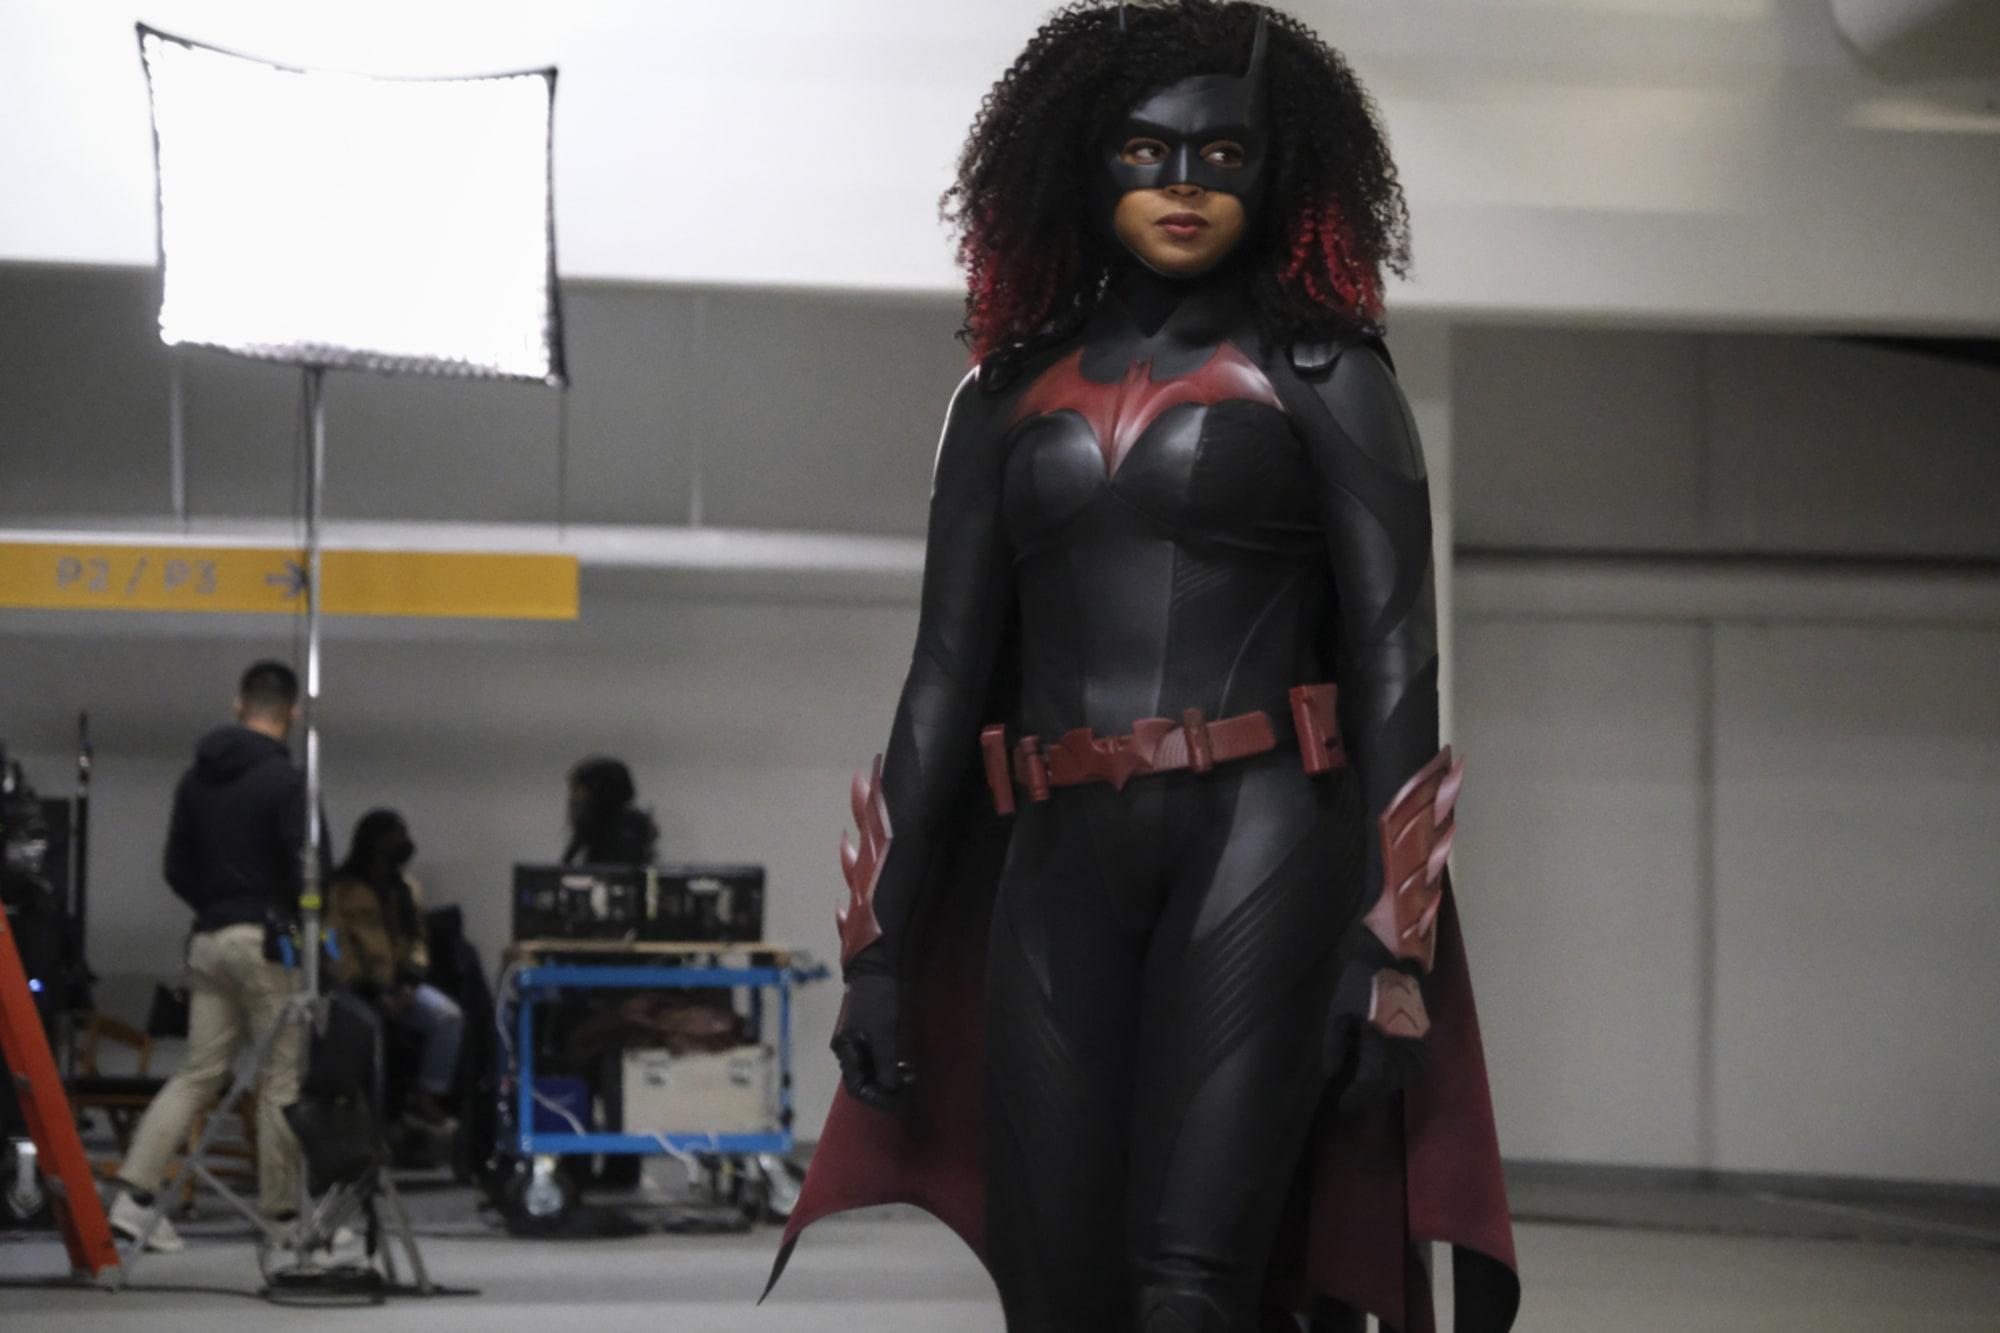 Batwoman season 3: Premiere, release date, cast, trailer and more